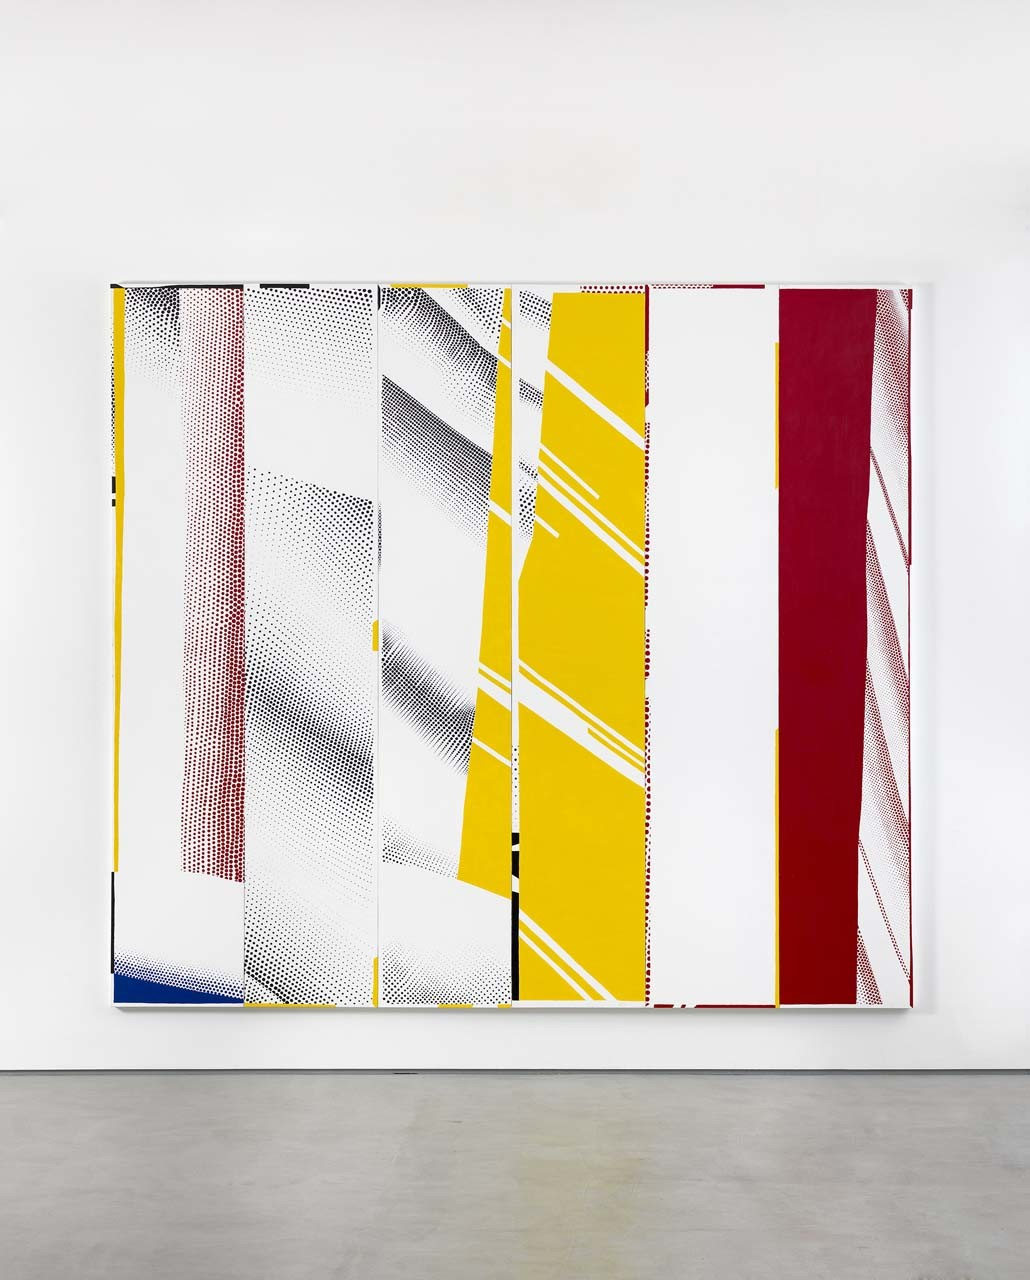 "<div class=""artwork_caption""><p>Group Self-portrait in ""Mirror #3 (Six Panels)"" (Michael, Nir, Jayne, Cy, Diego, Rebecca), 2015</p></div>"